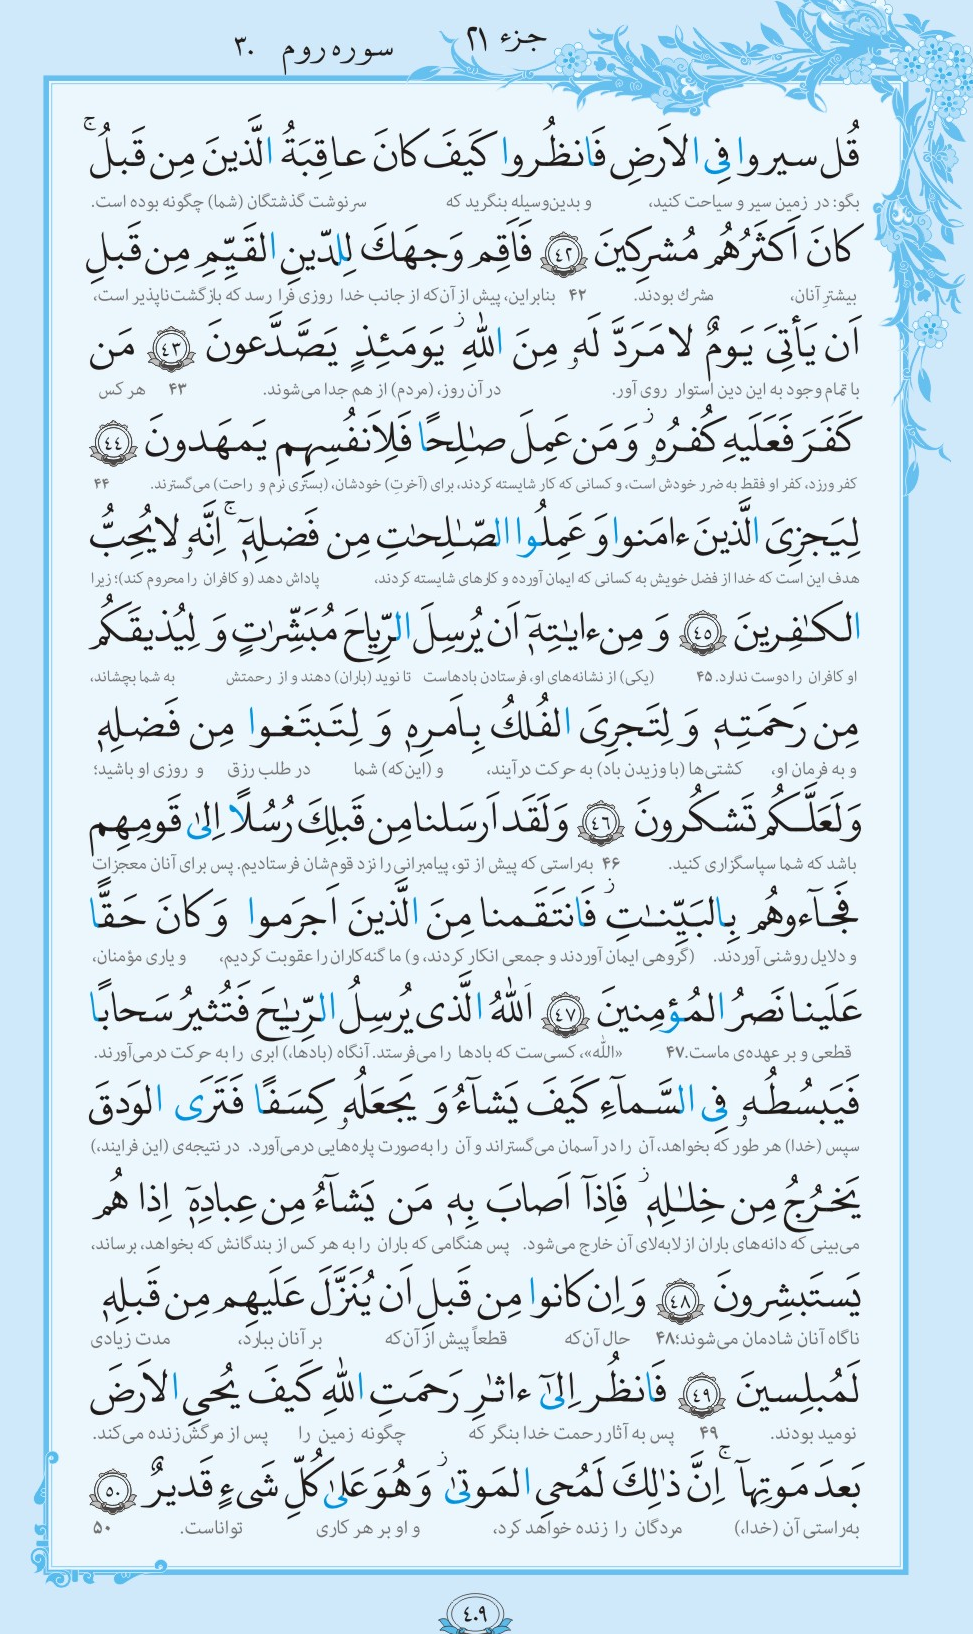 13990410000960 Test NewPhotoFree - ترتیل صفحه ۴۰۹ قرآن باصدای مصطفی اسماعیل+صوت و متن